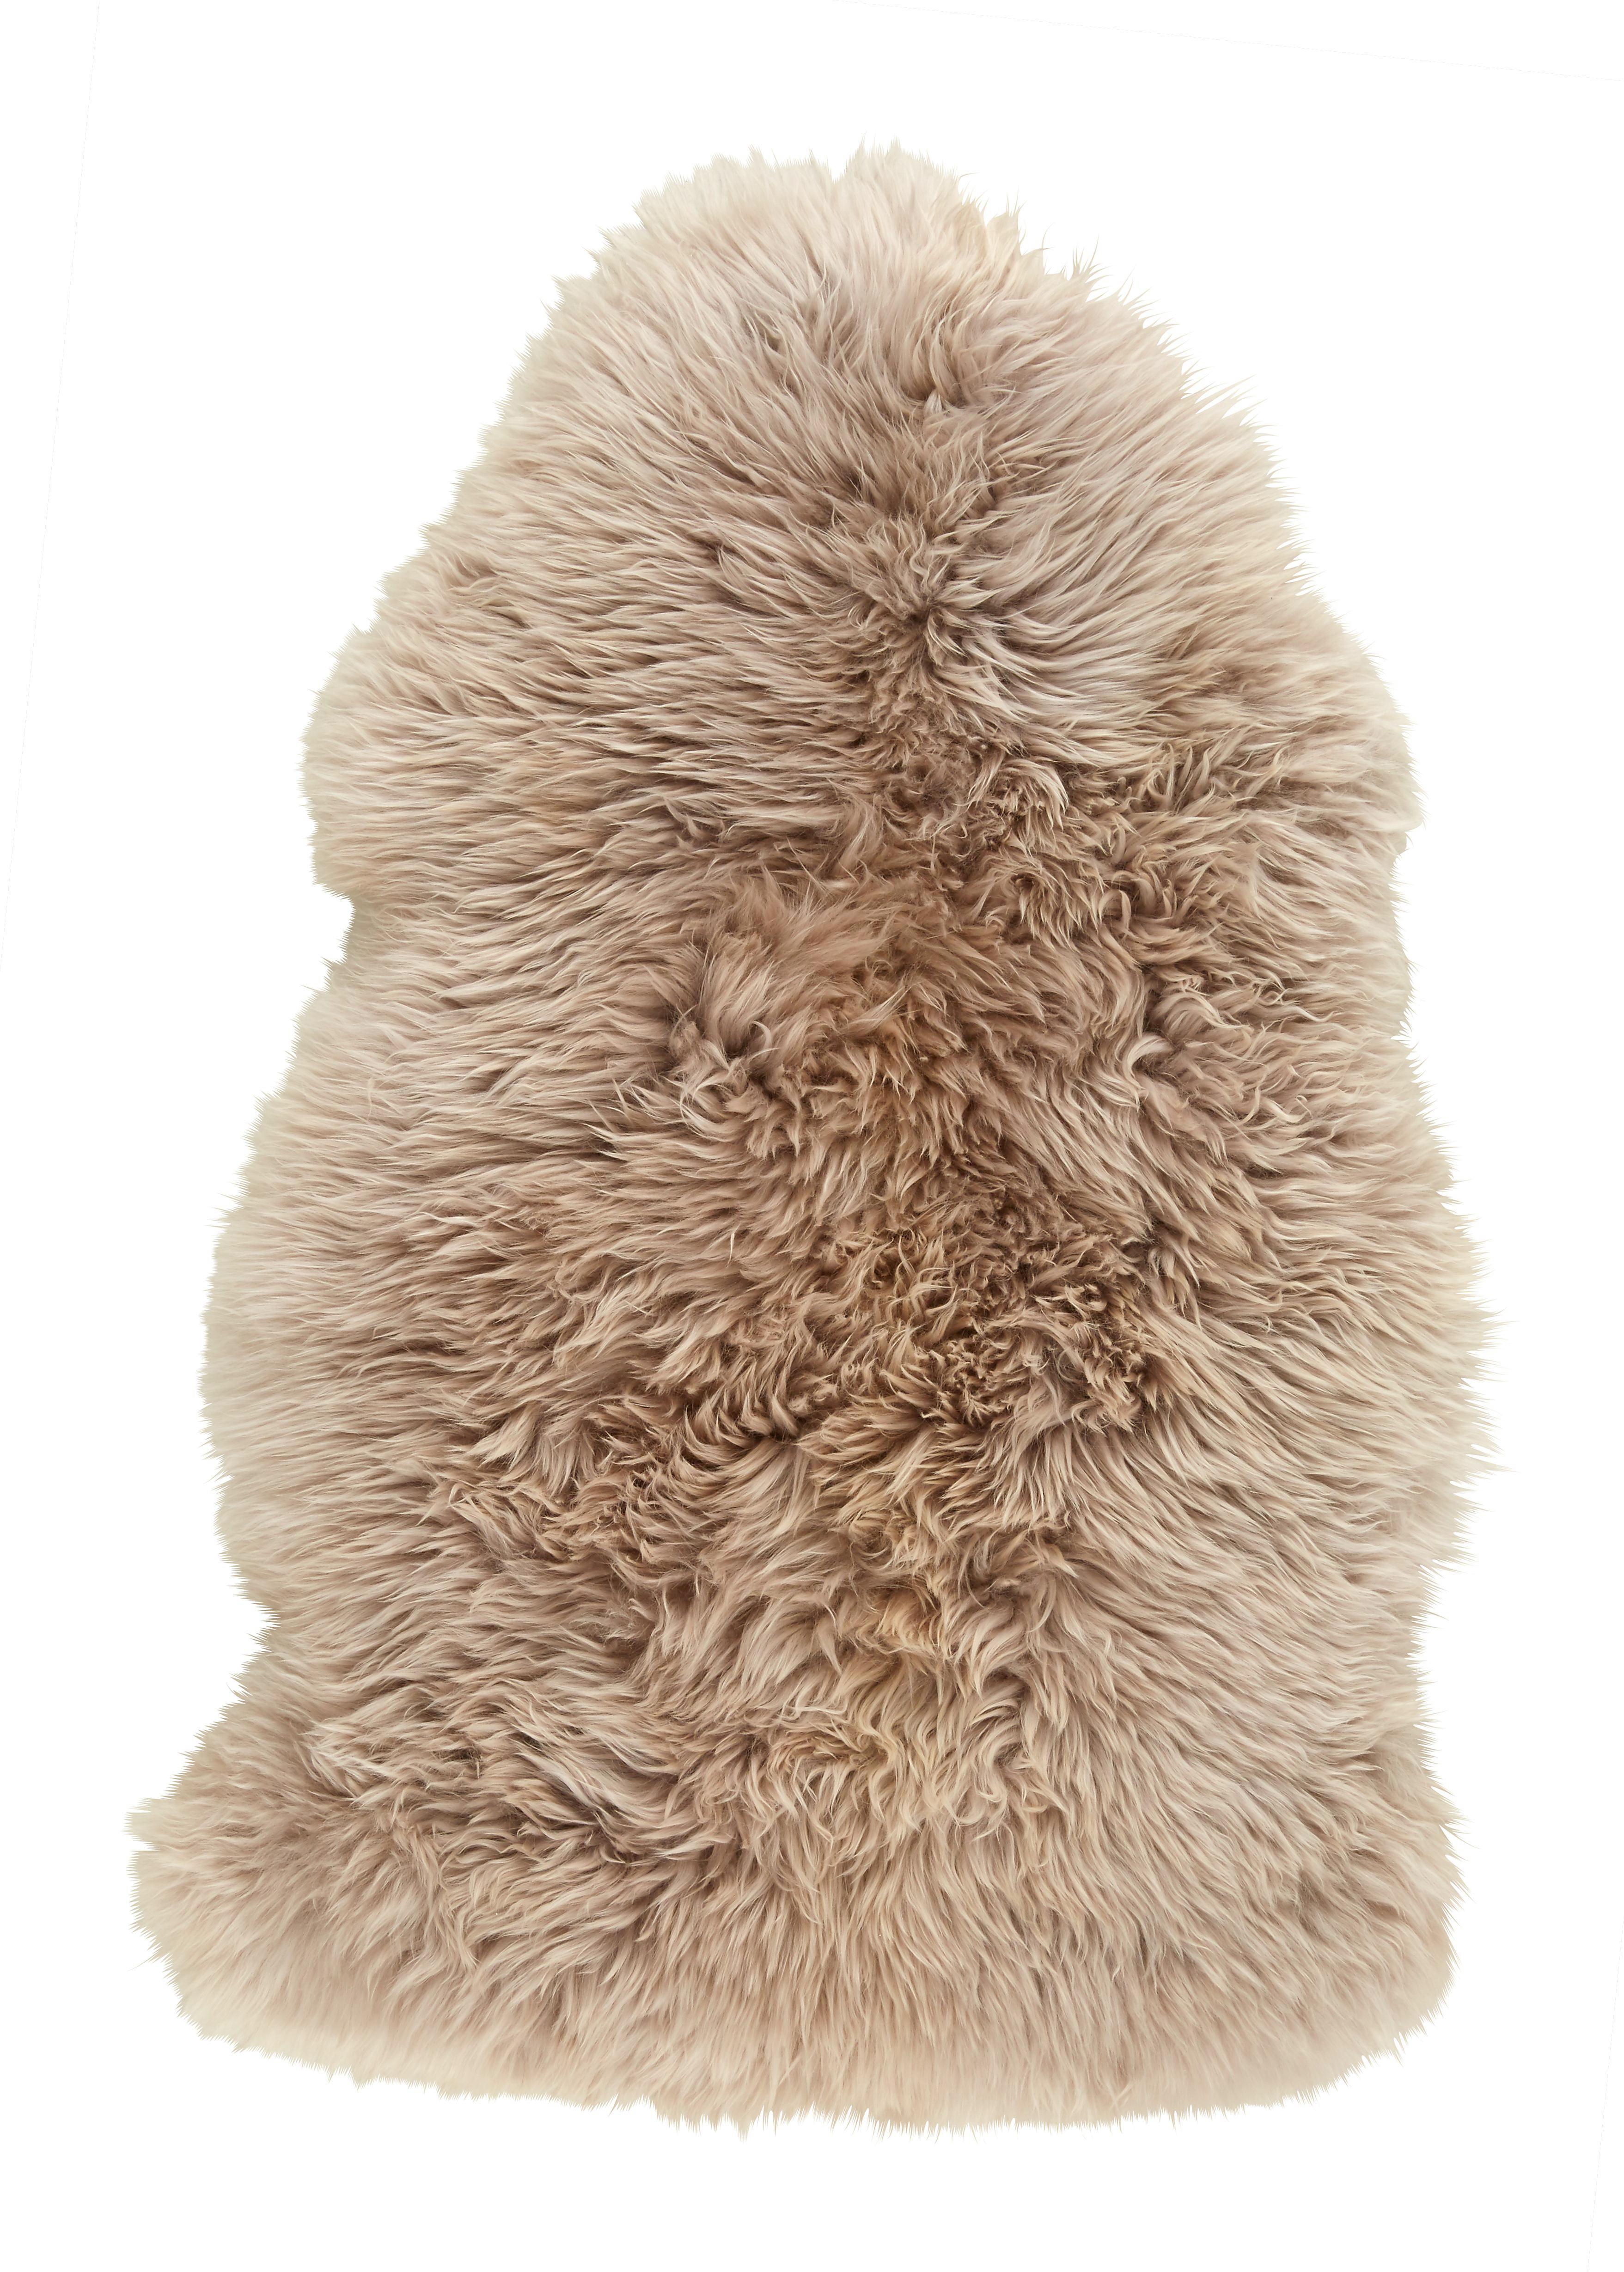 Schaffell Jenny in Beige, ca. 90x60cm - Beige, Textil (90-105/60cm) - MÖMAX modern living